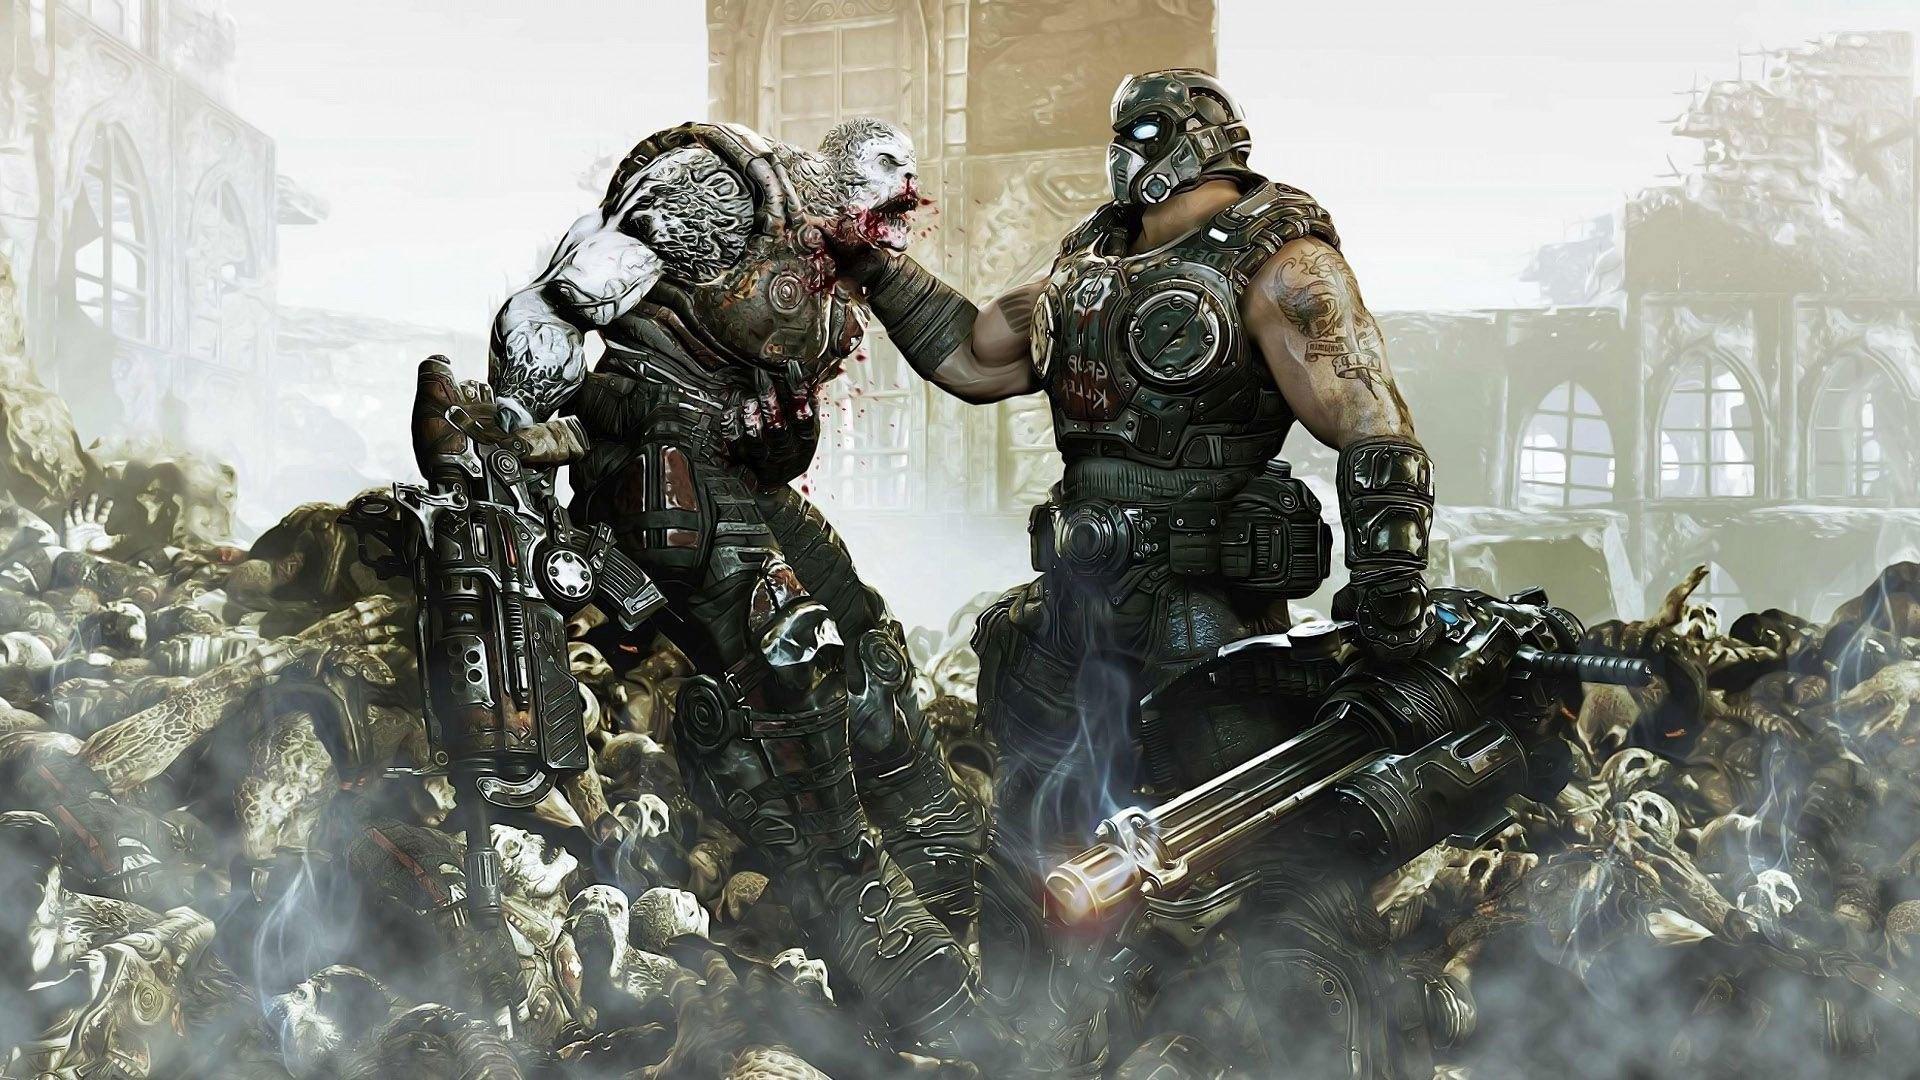 2016 Gears Of War 4 Hd Hd Games 4k Wallpapers Images